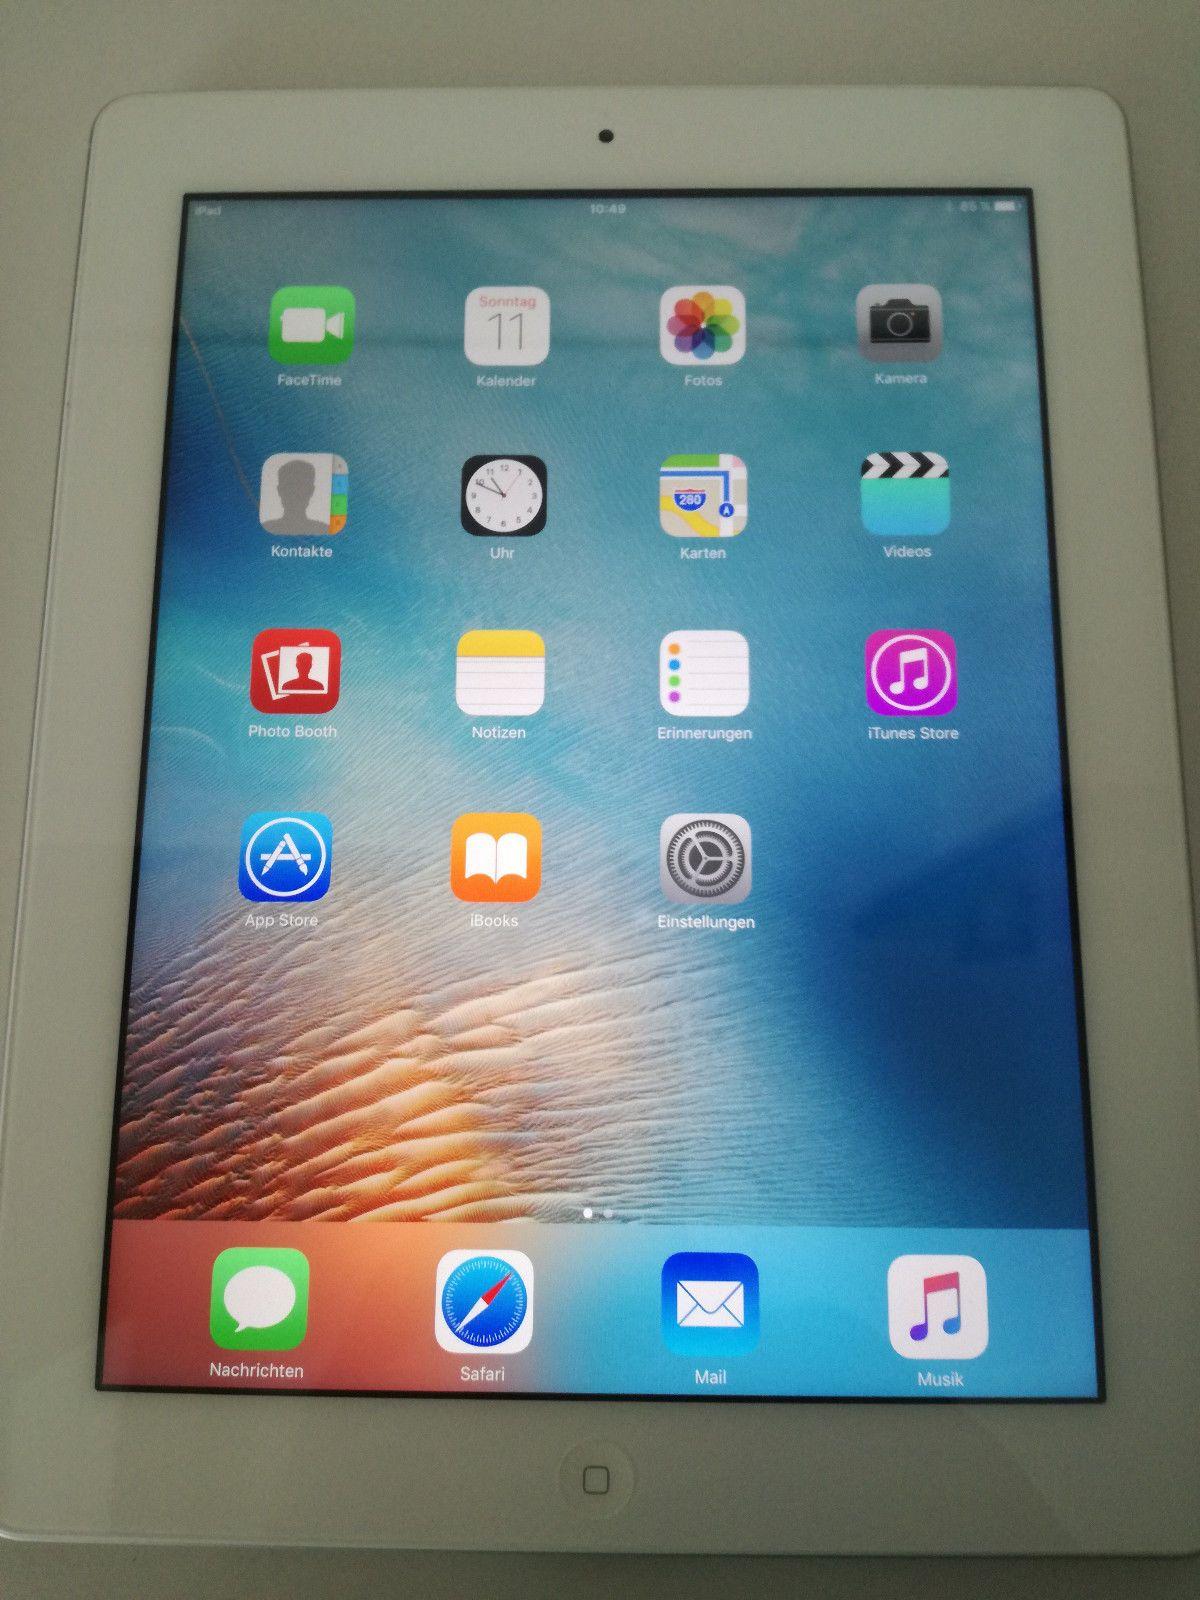 980641e90f07d Ebay Angebot Apple iPad 3. Generation Wi-Fi 16GB, WLAN, 24,6 cm (9,7 ...